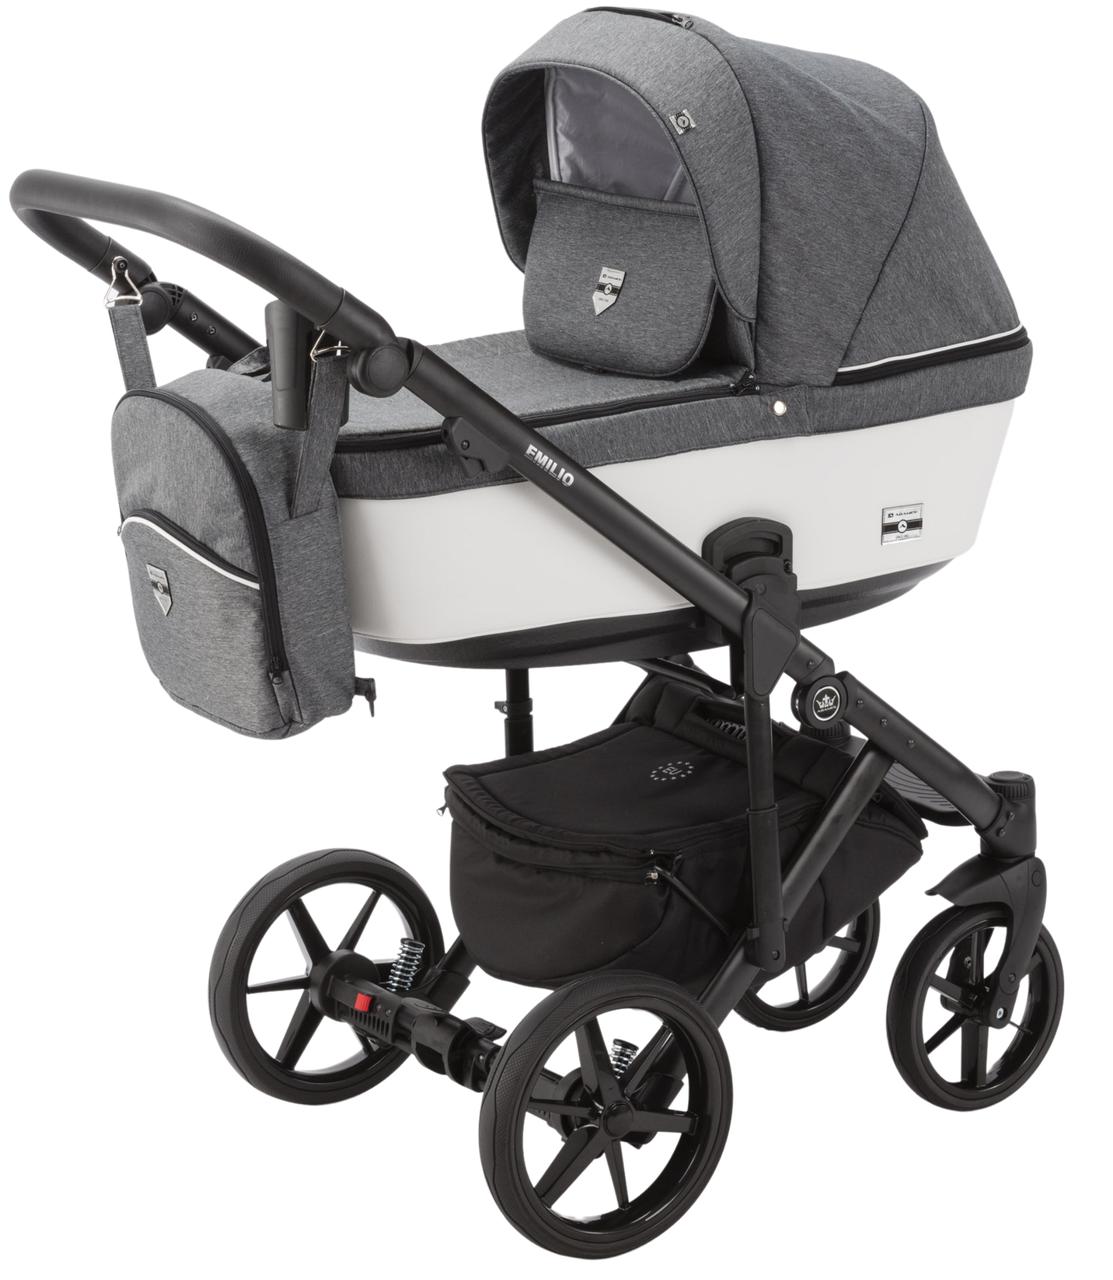 Дитяча універсальна коляска 2 в 1 Adamex Emilio EM-241